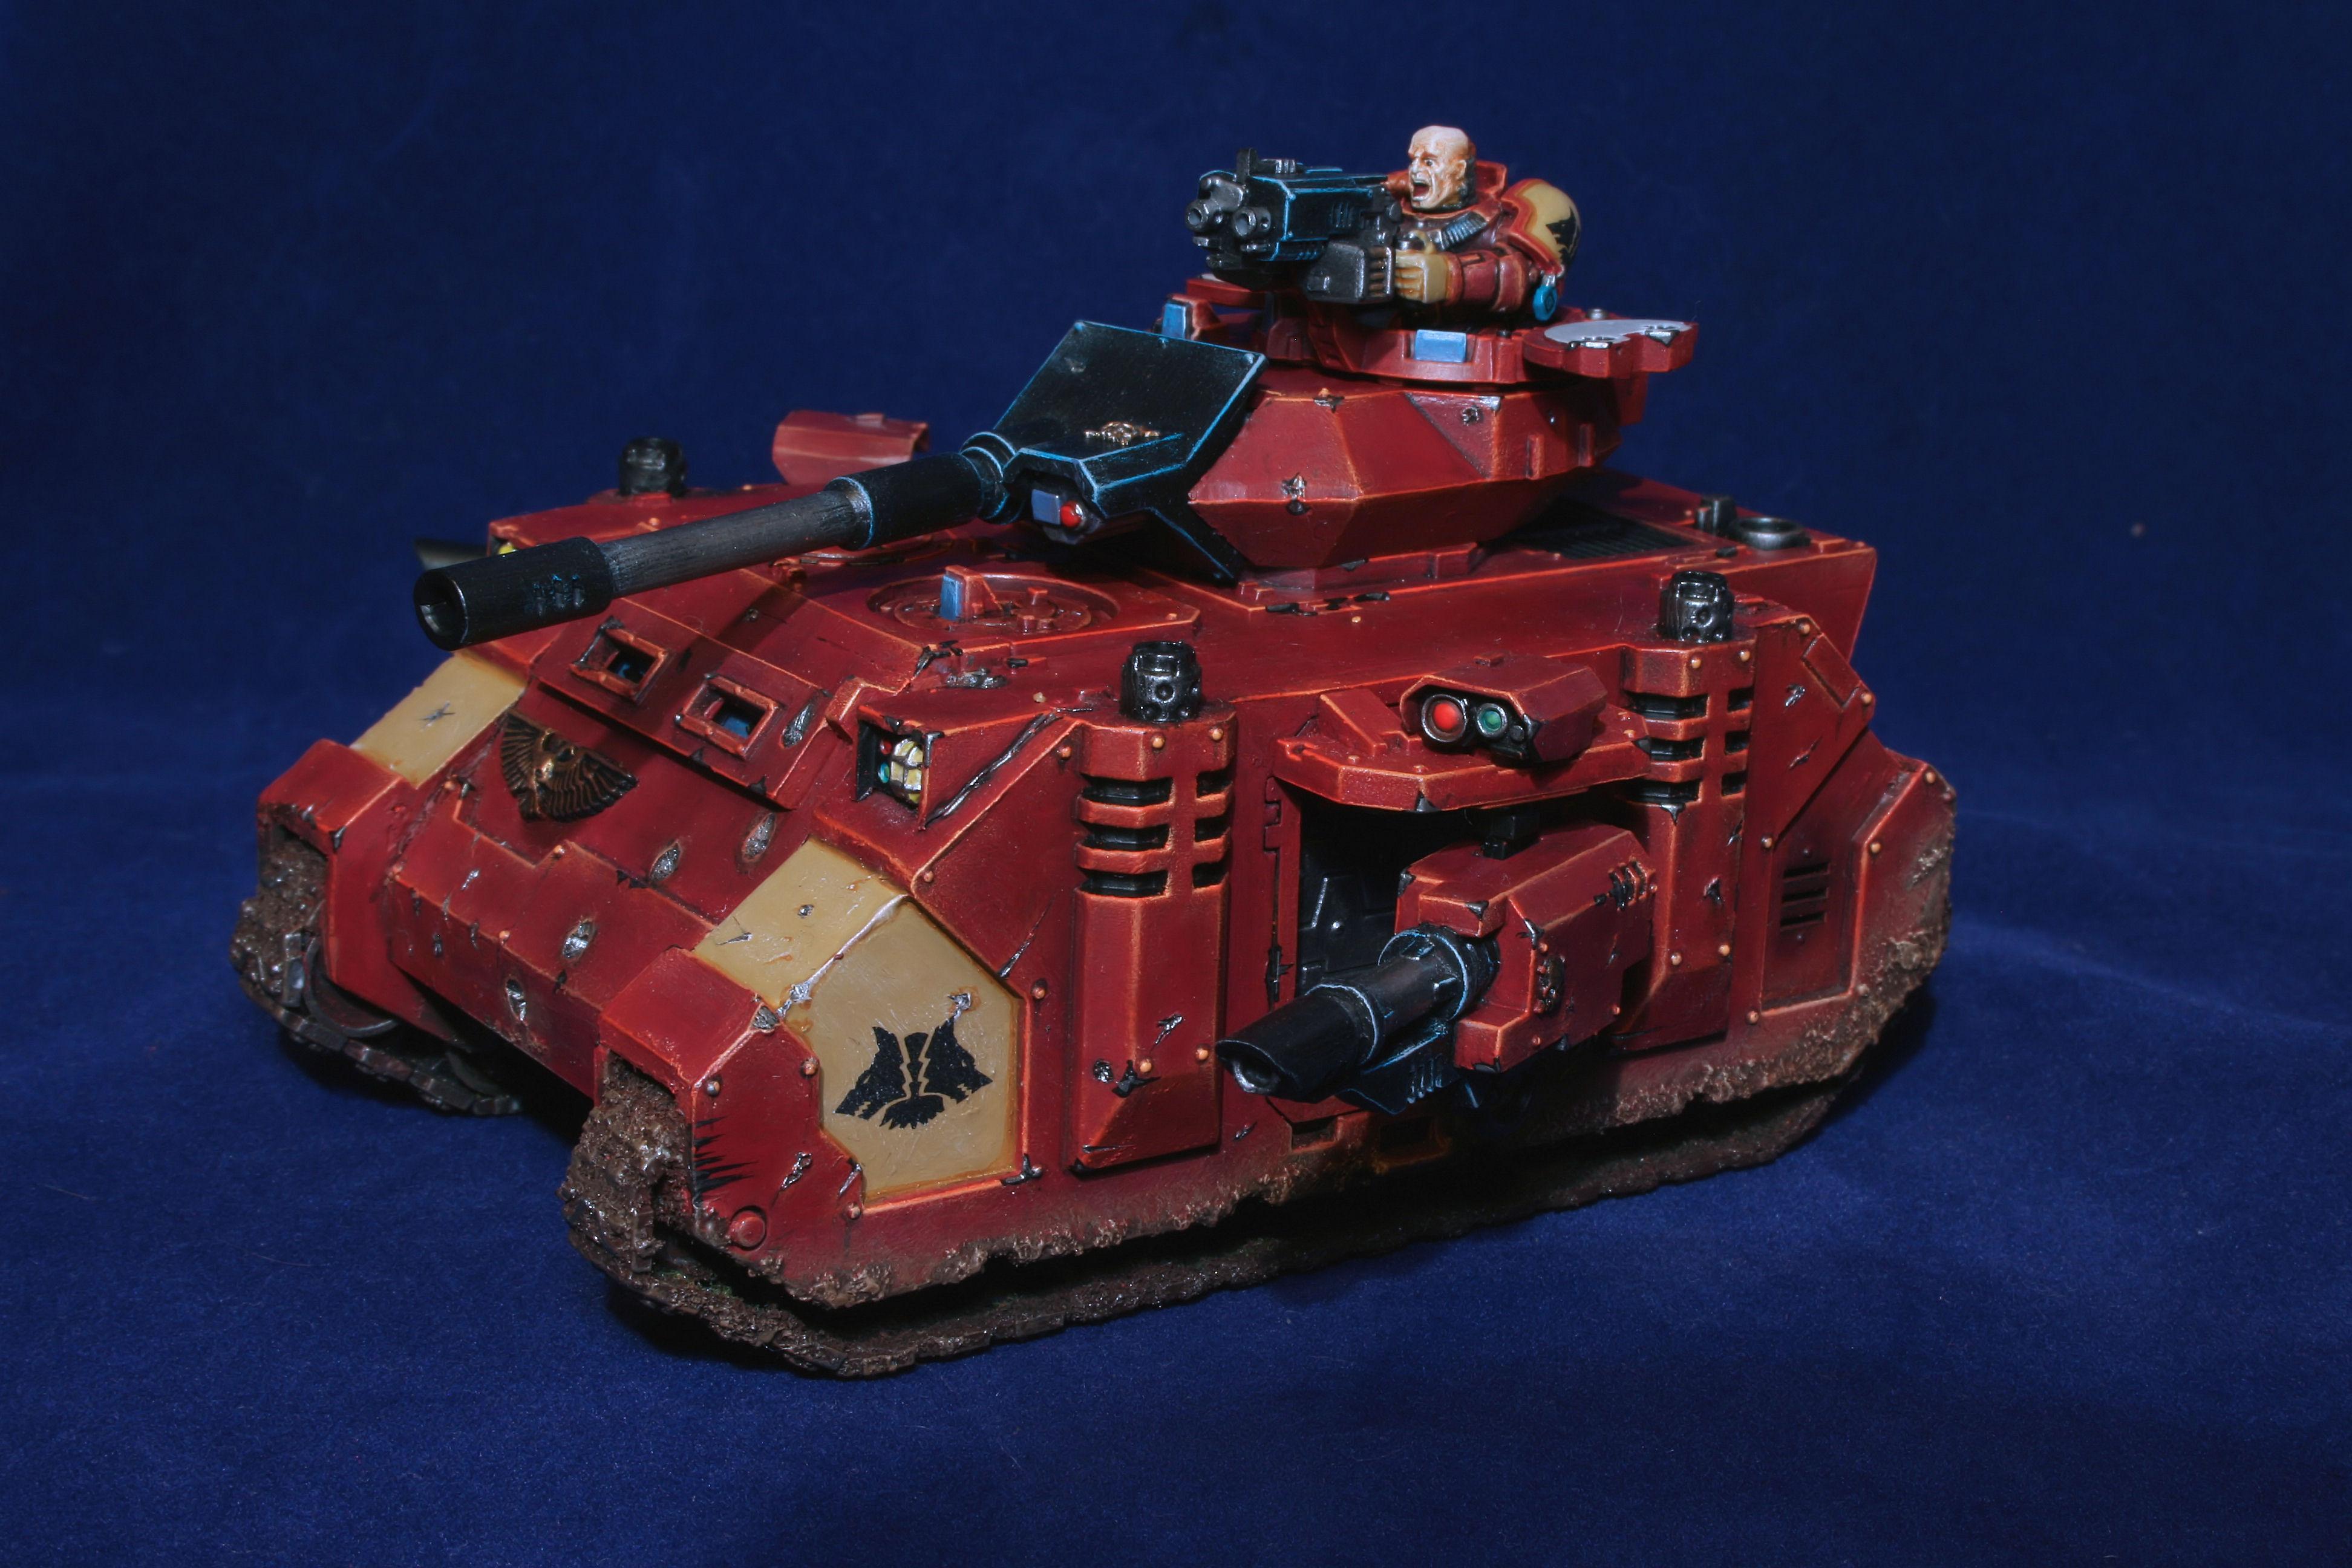 Lycan, Preadator, Predator, Tank